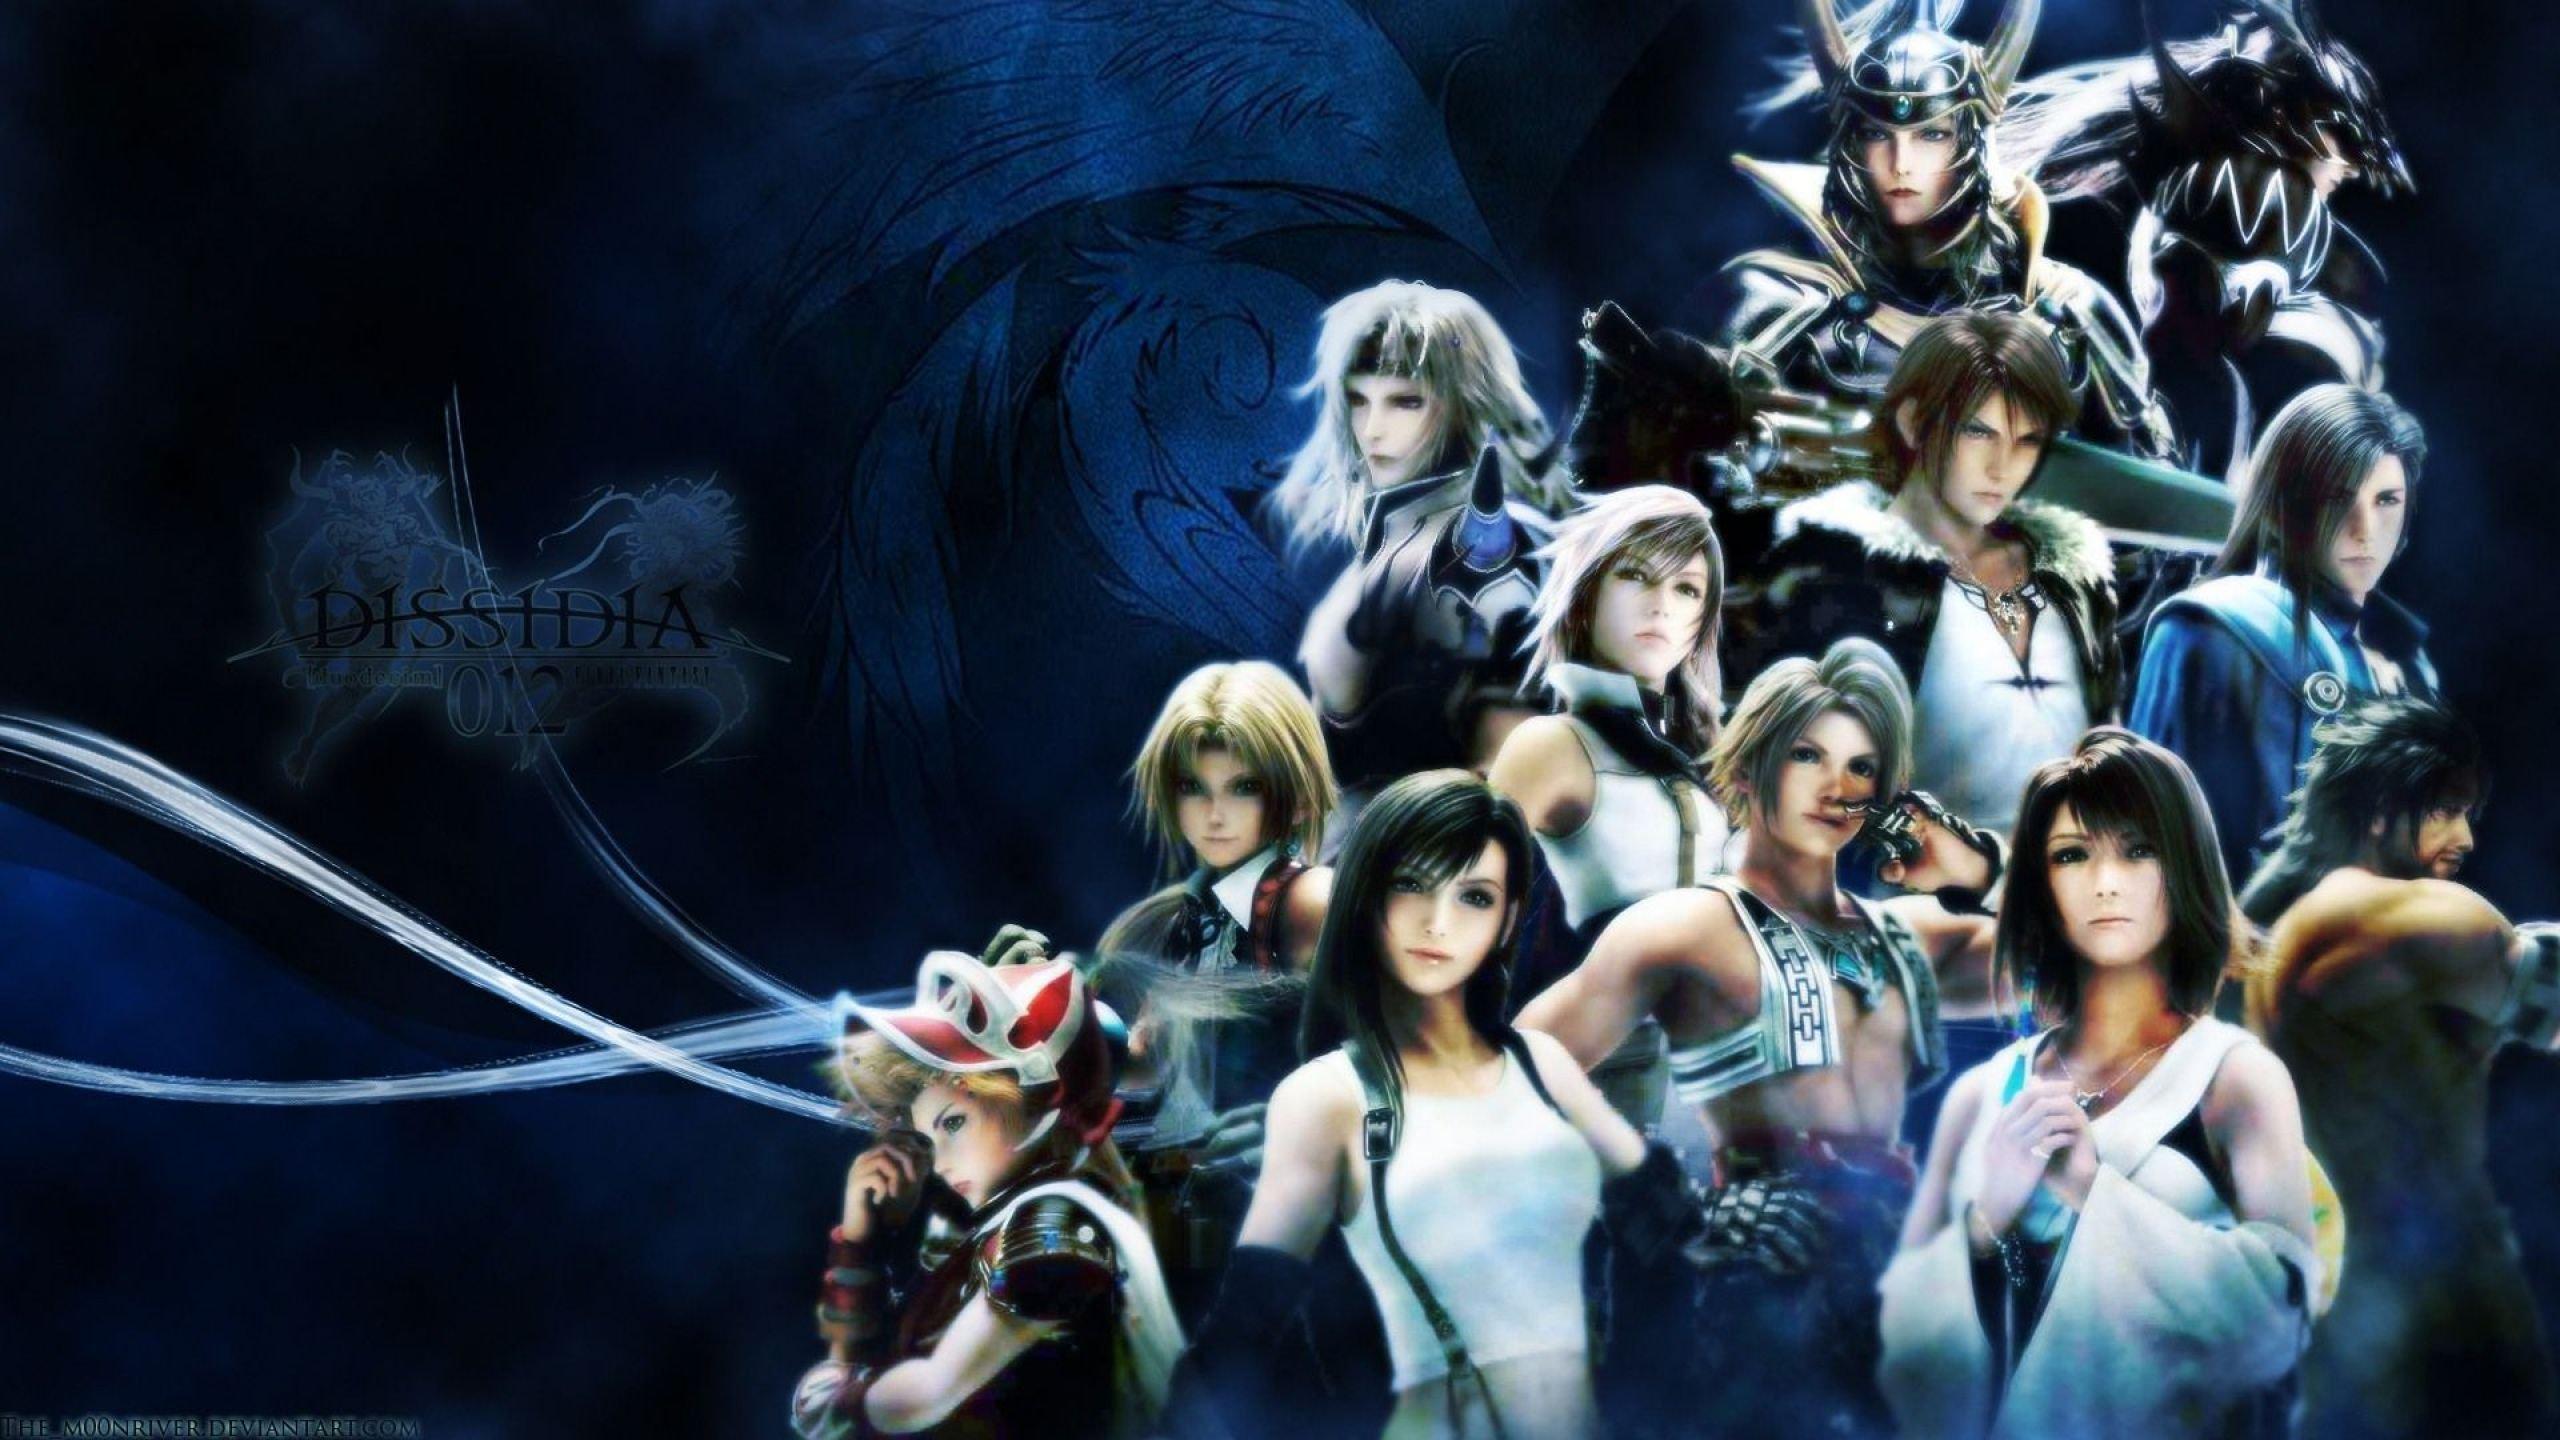 Final Fantasy Dissidia Action Adventure Fighting Combat Tps 1ffdissidia Wallpaper 2560x1440 575607 Wallpaperup